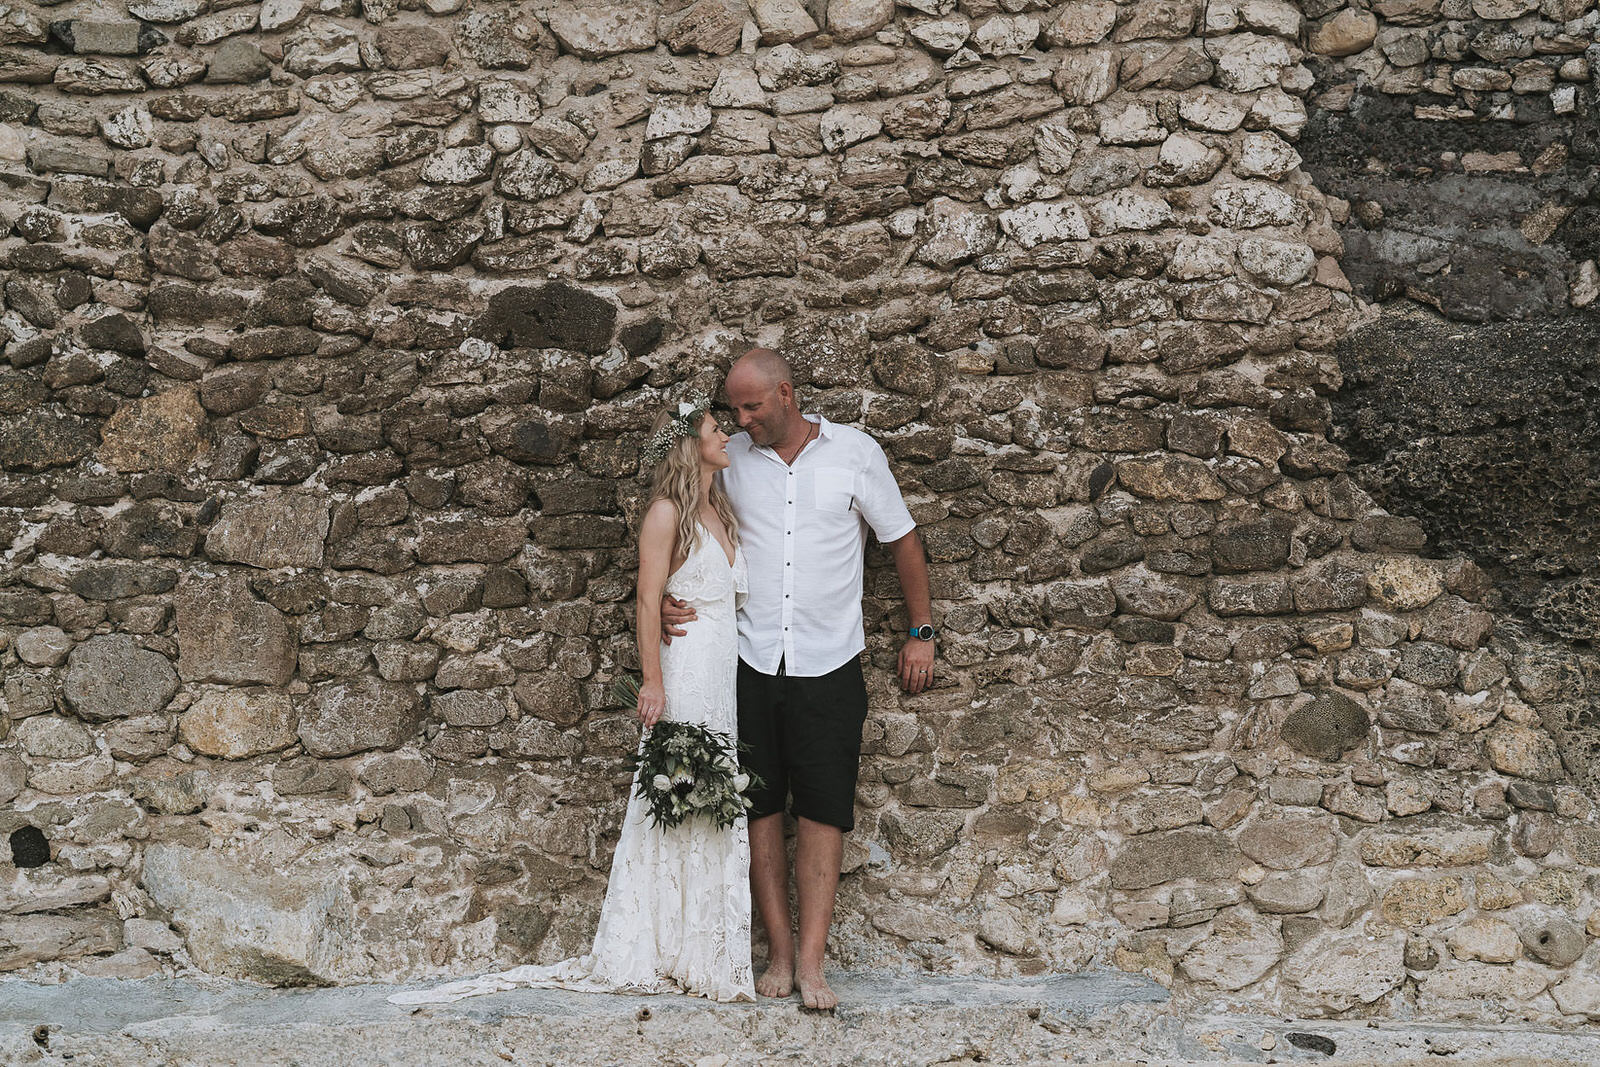 newfound-hai-tide-nusa-lembongan-bali-wedding-photographers-137